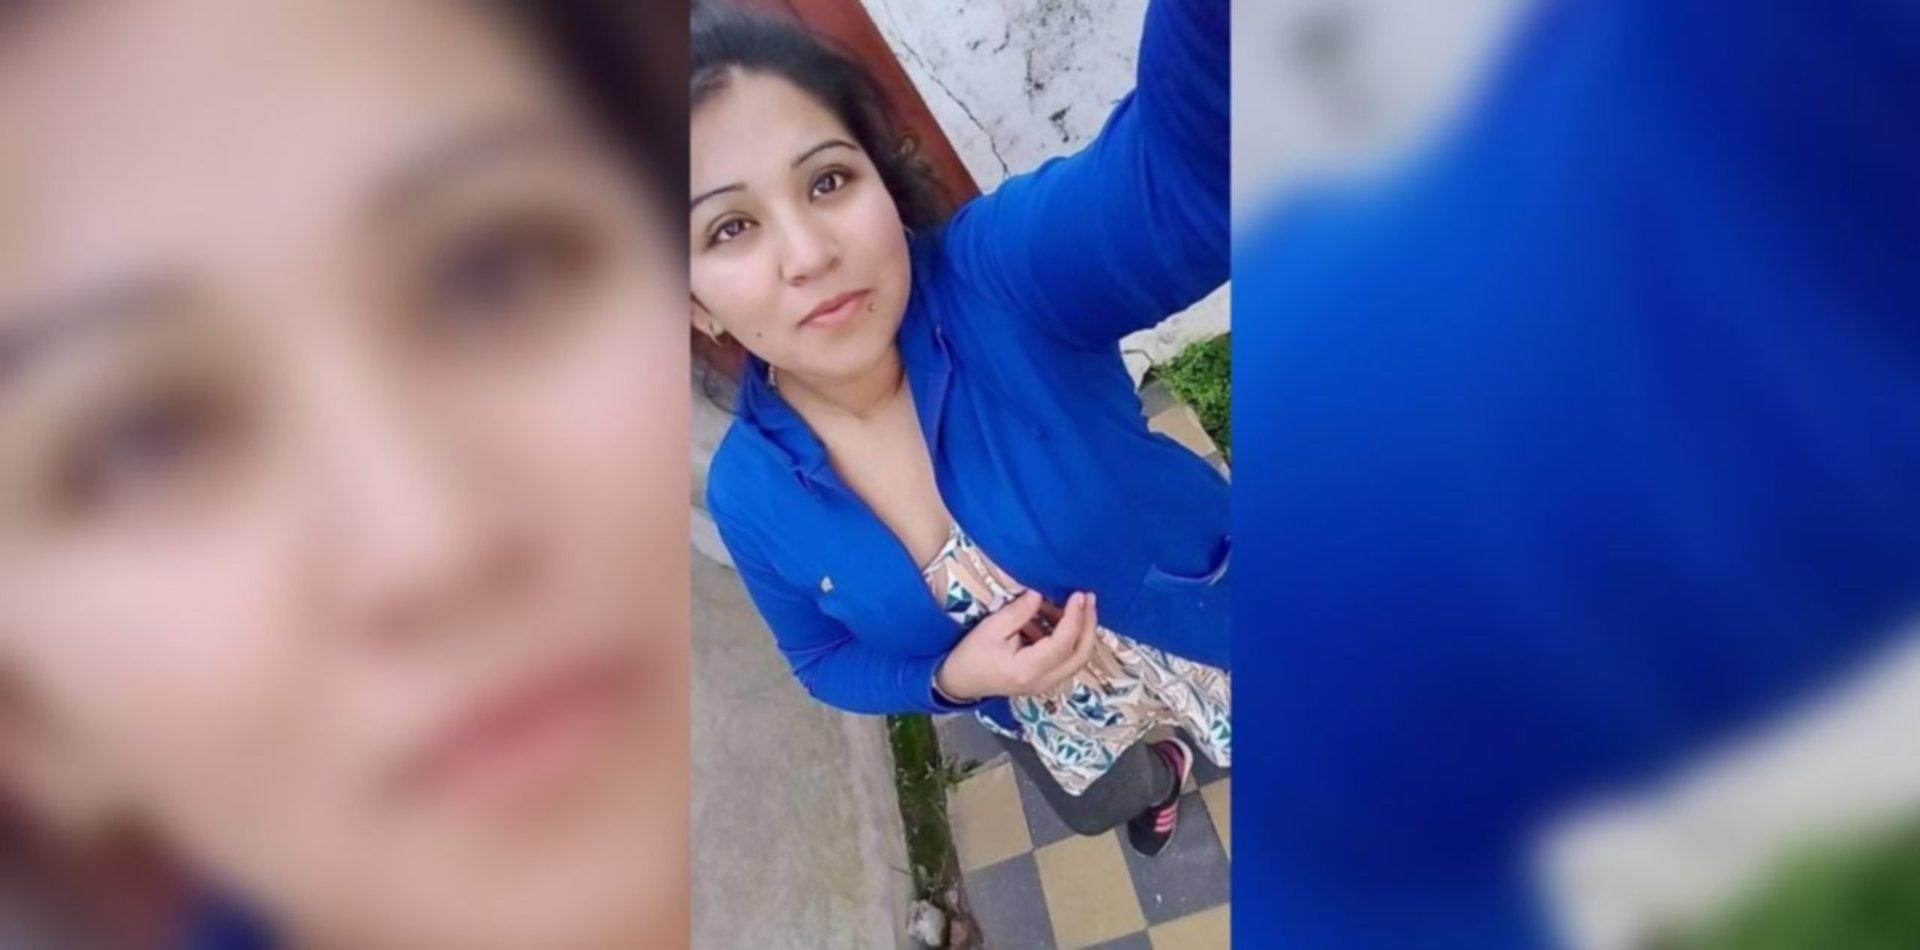 Buscan desesperadamente a una embarazada que desapareció en La Plata